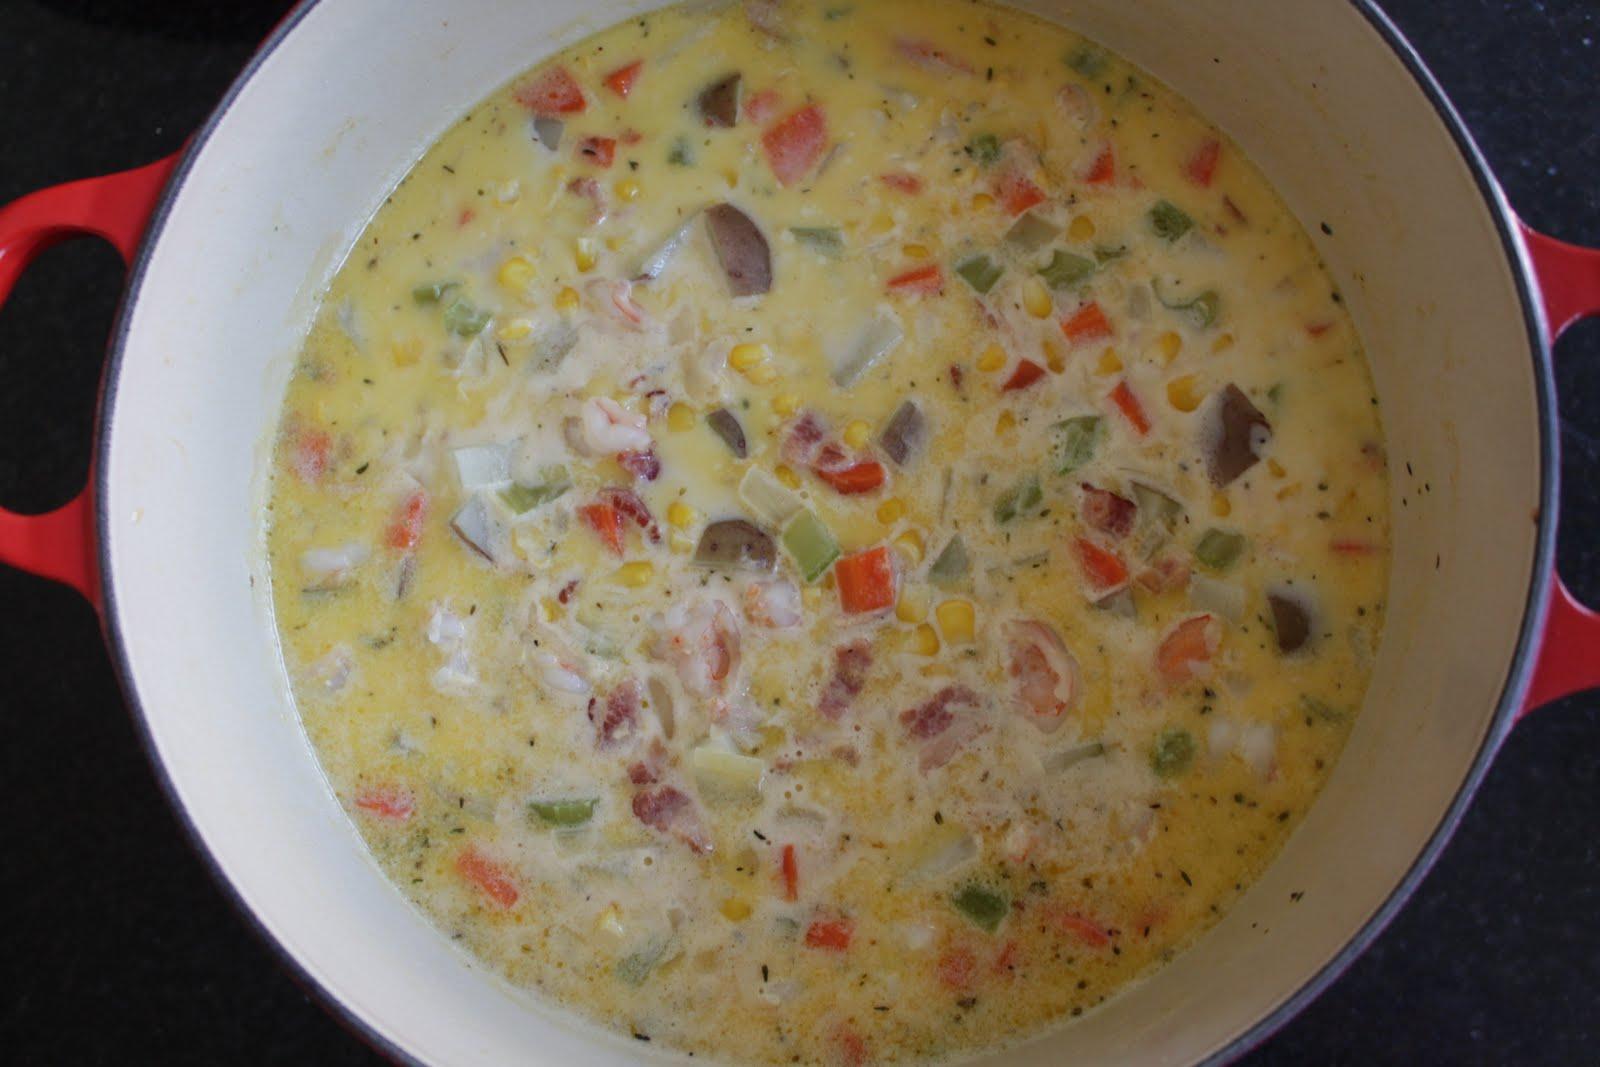 Malisa's Food Blog: Shrimp Corn Chowder